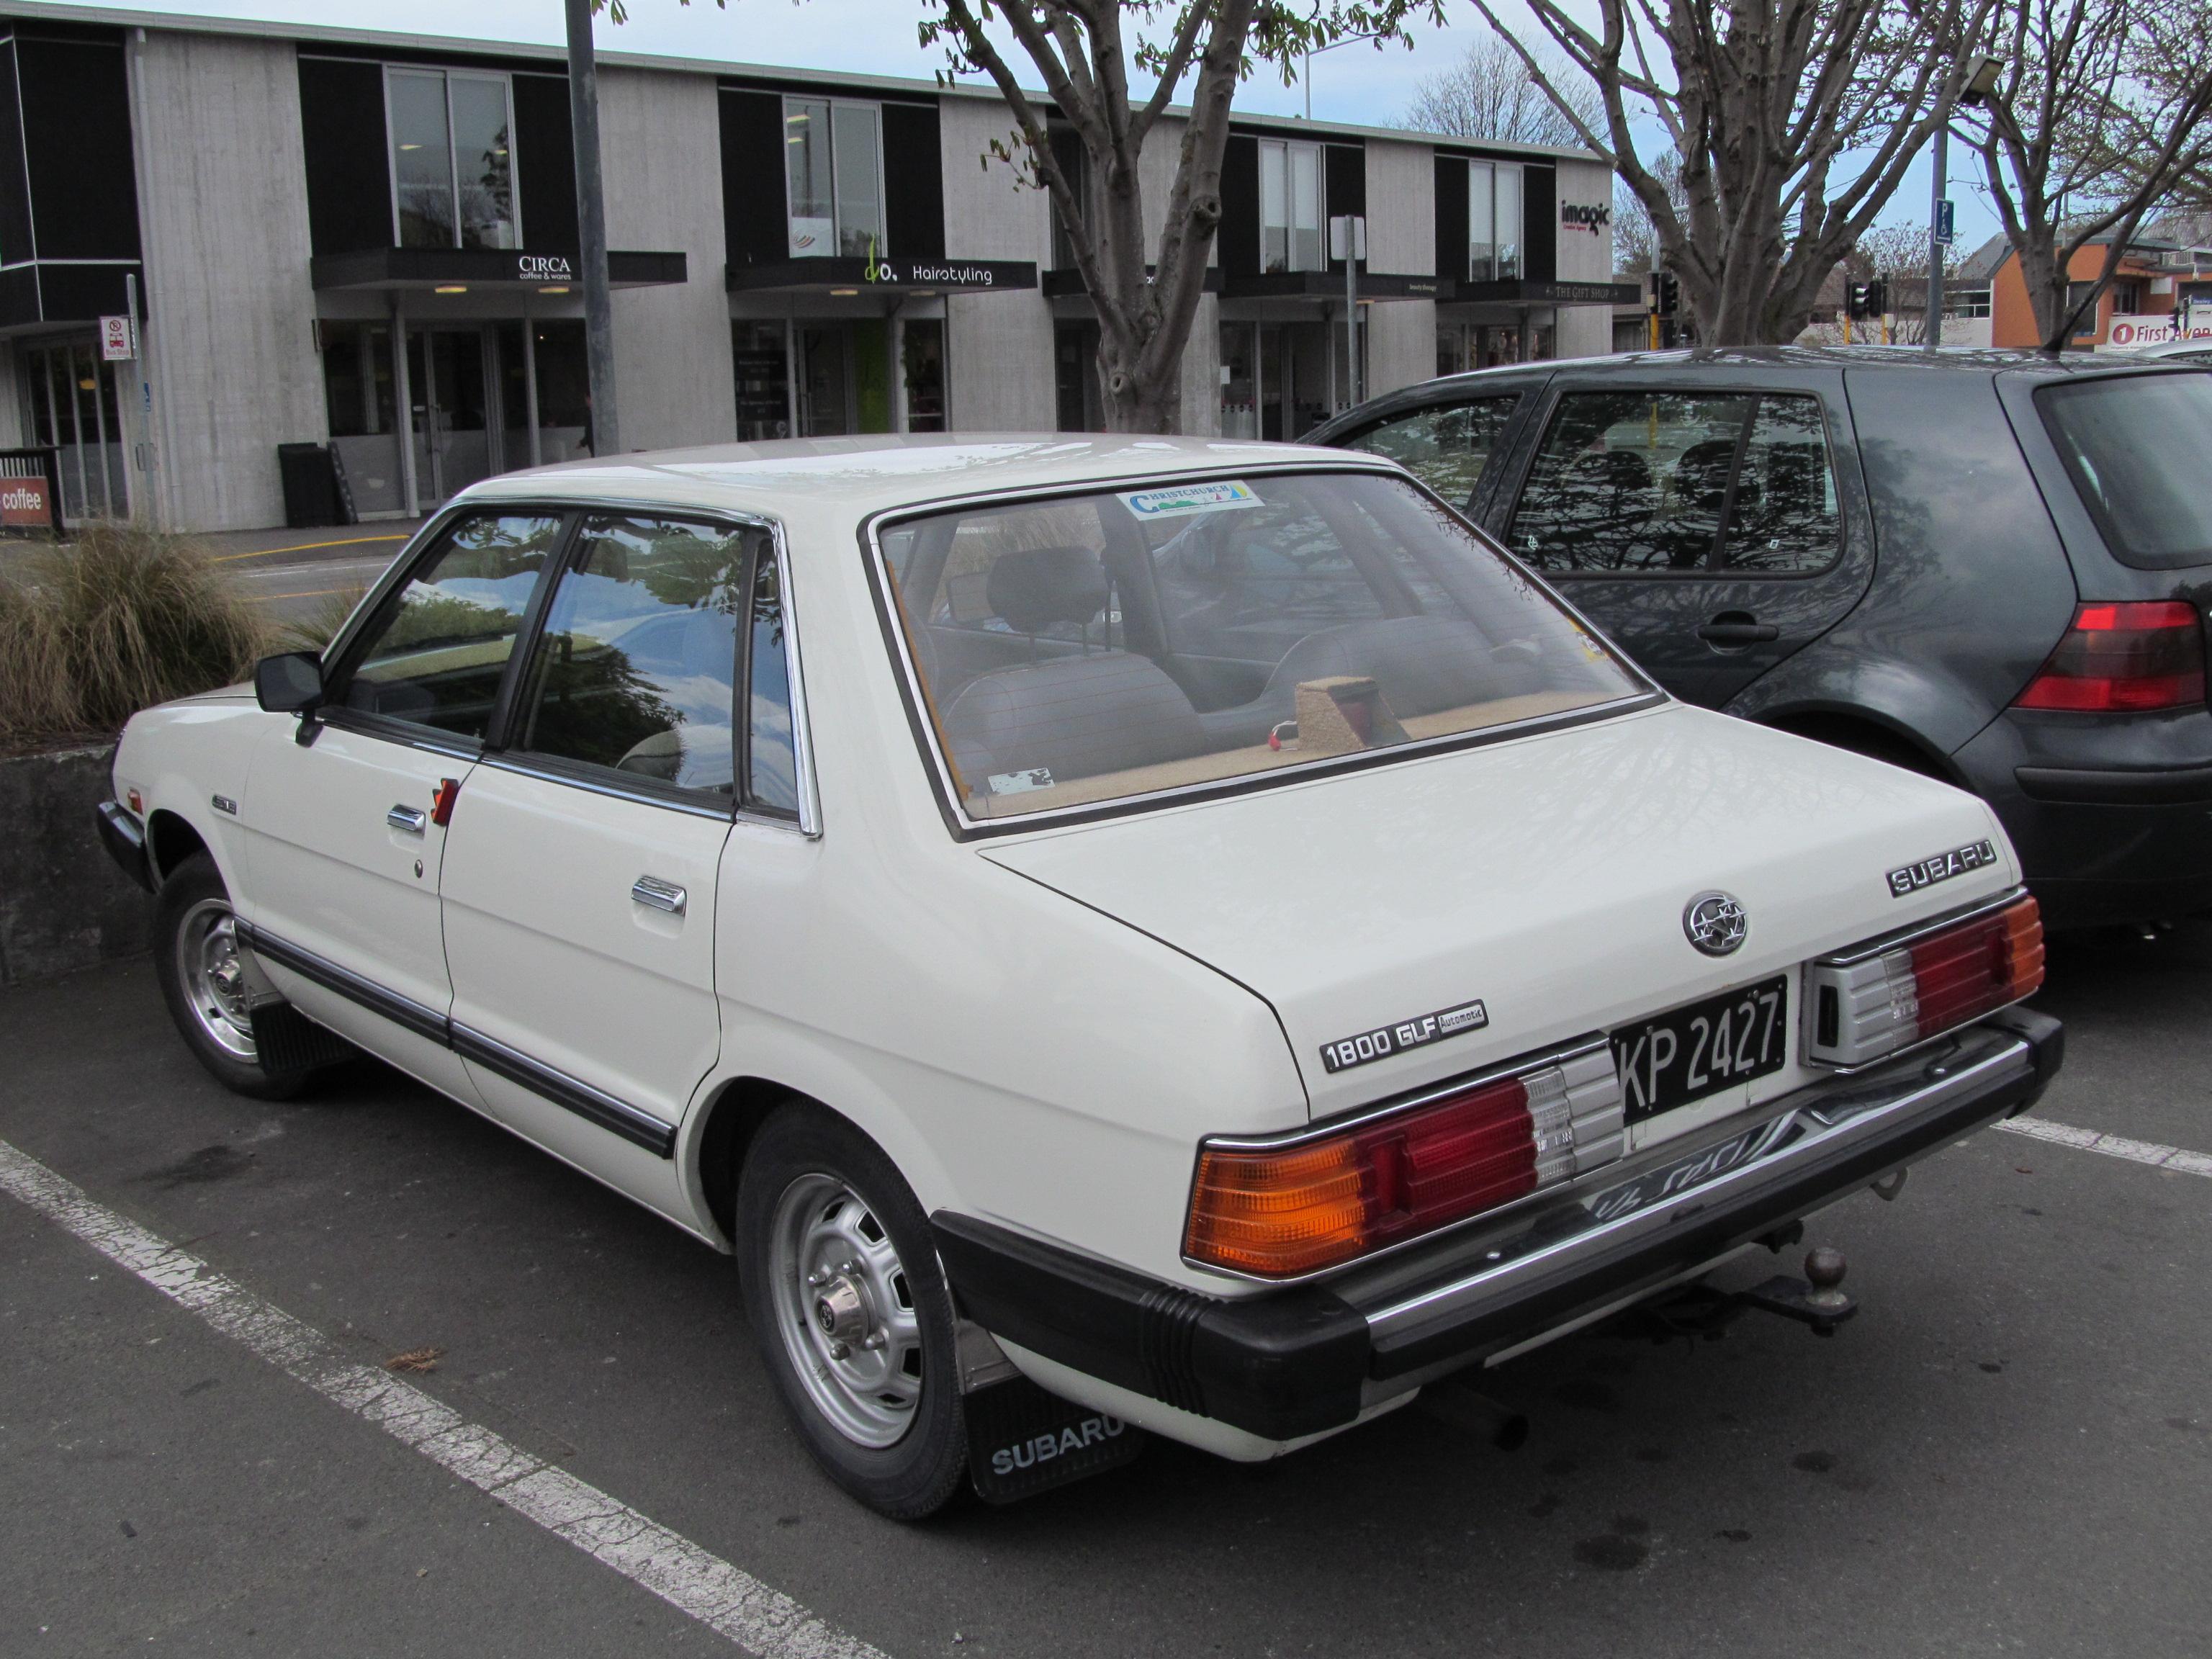 Subaru Gl Fuse Box Archive Of Automotive Wiring Diagram 1982 C10 1990 Rh Kitchendecor Club